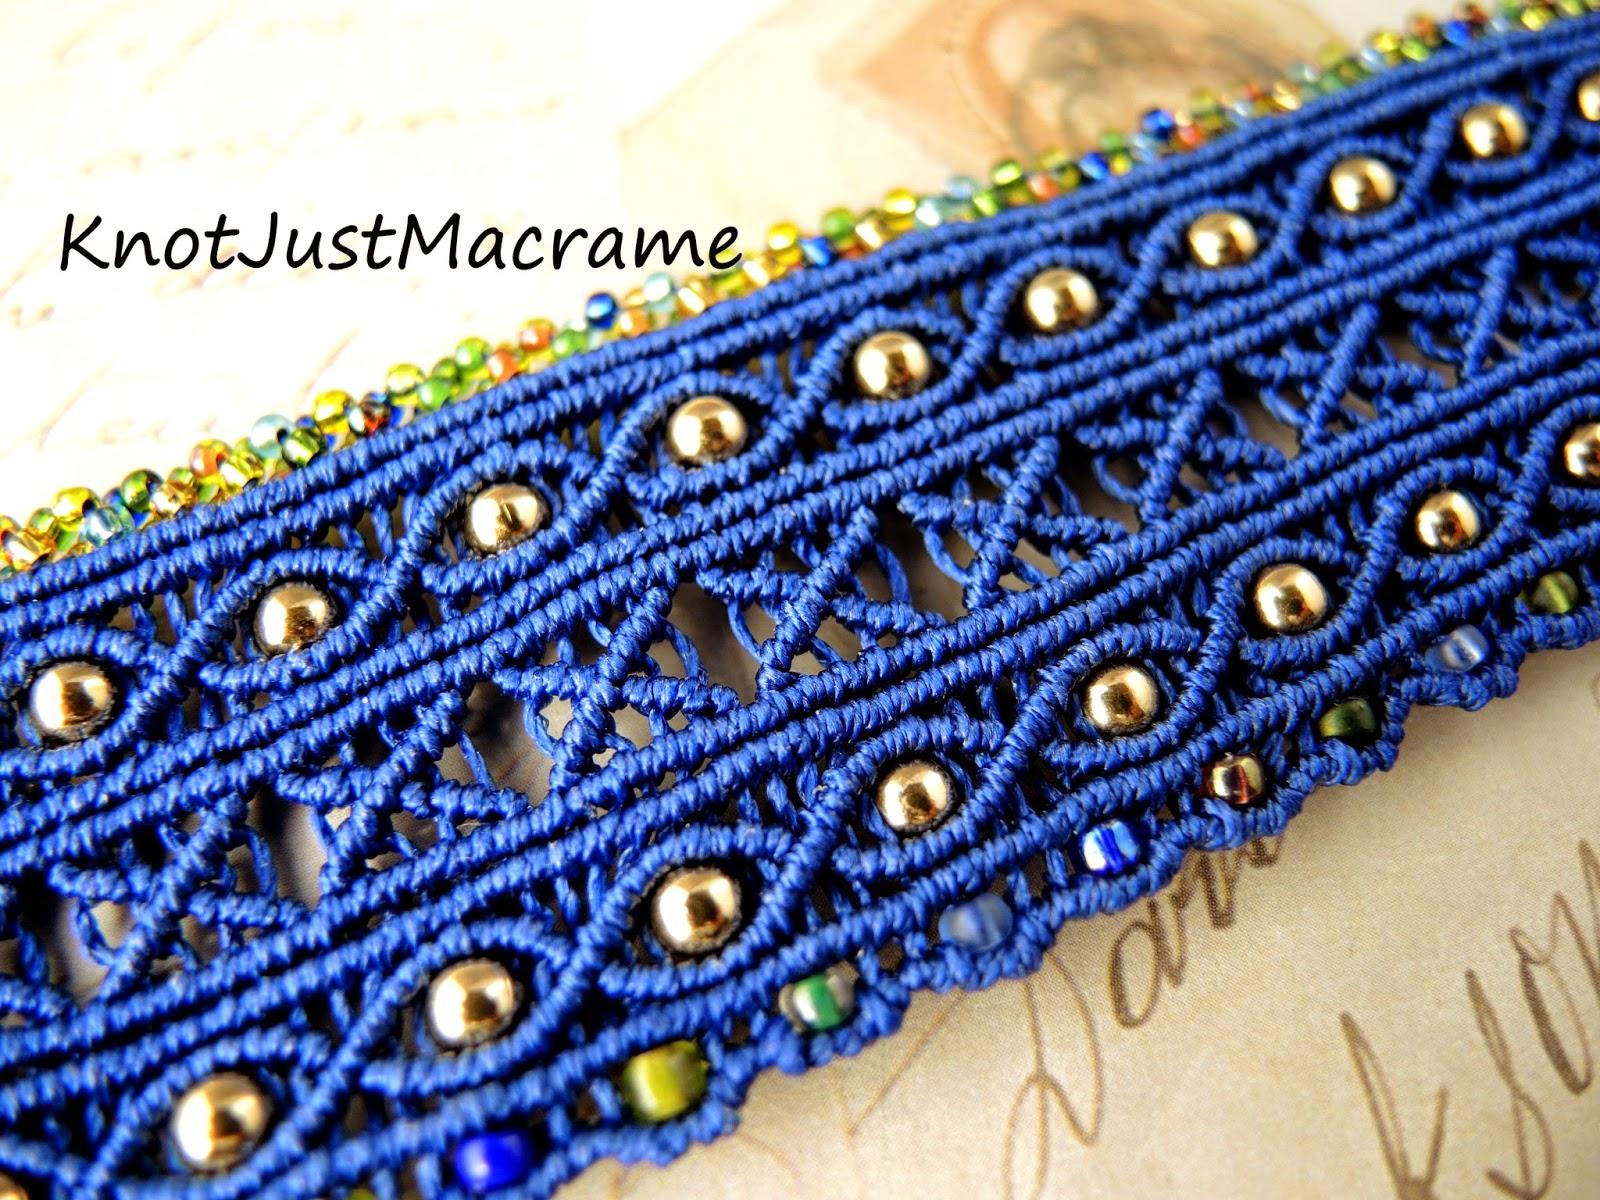 Argus micro macrame cuff in blue by Sherri Stokey